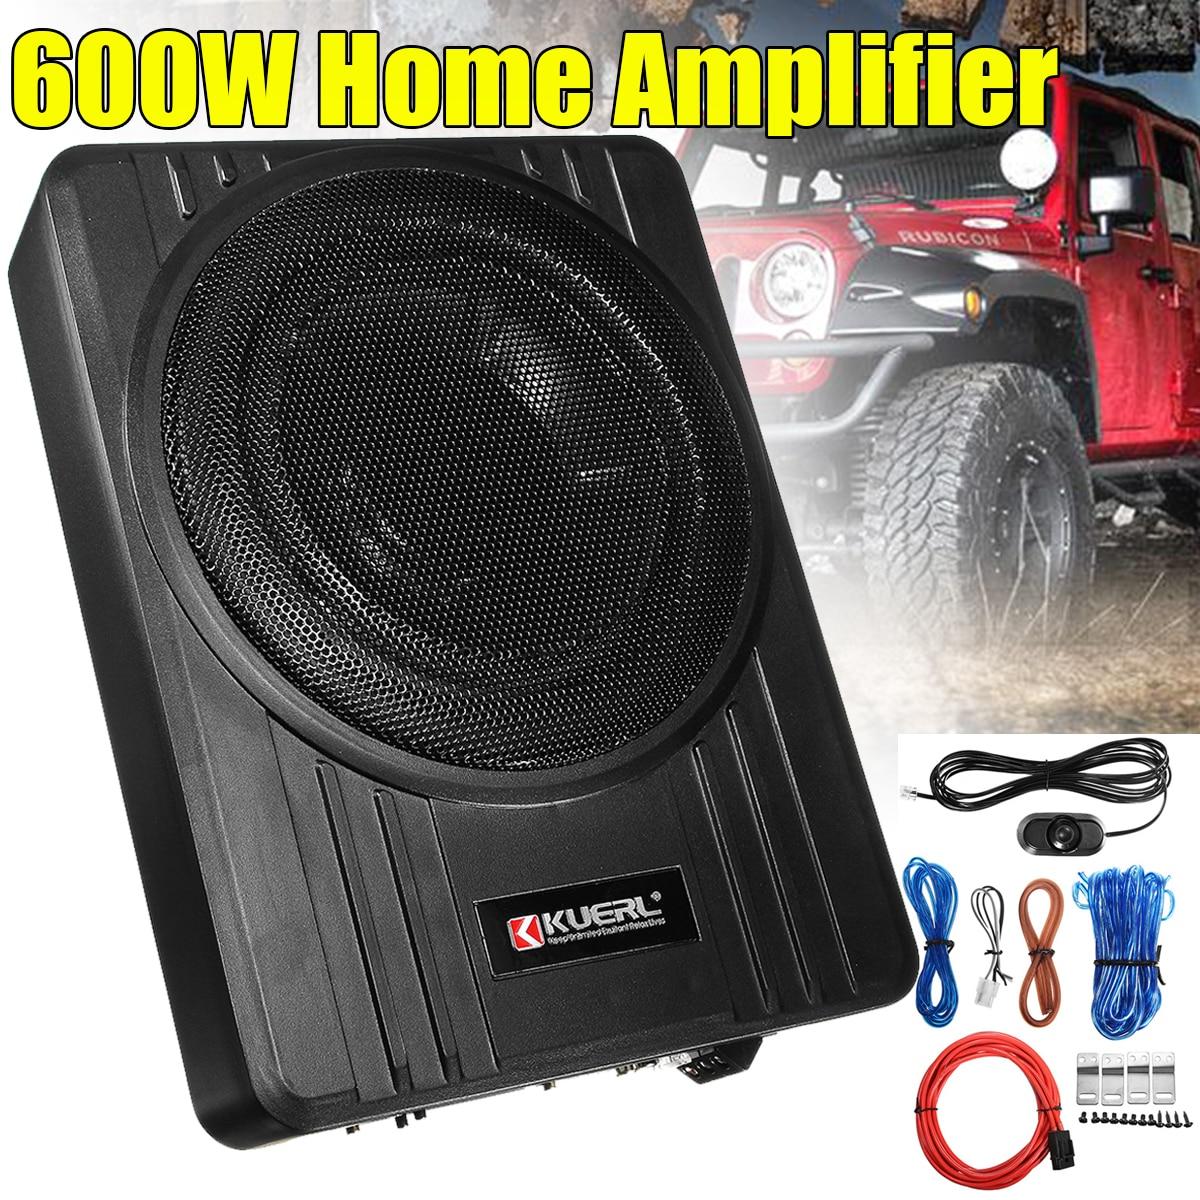 Car Subwoofer Amplifier-Amp Car-Speaker Powered Super-Bass Under-Seat 10inch 600W Slim